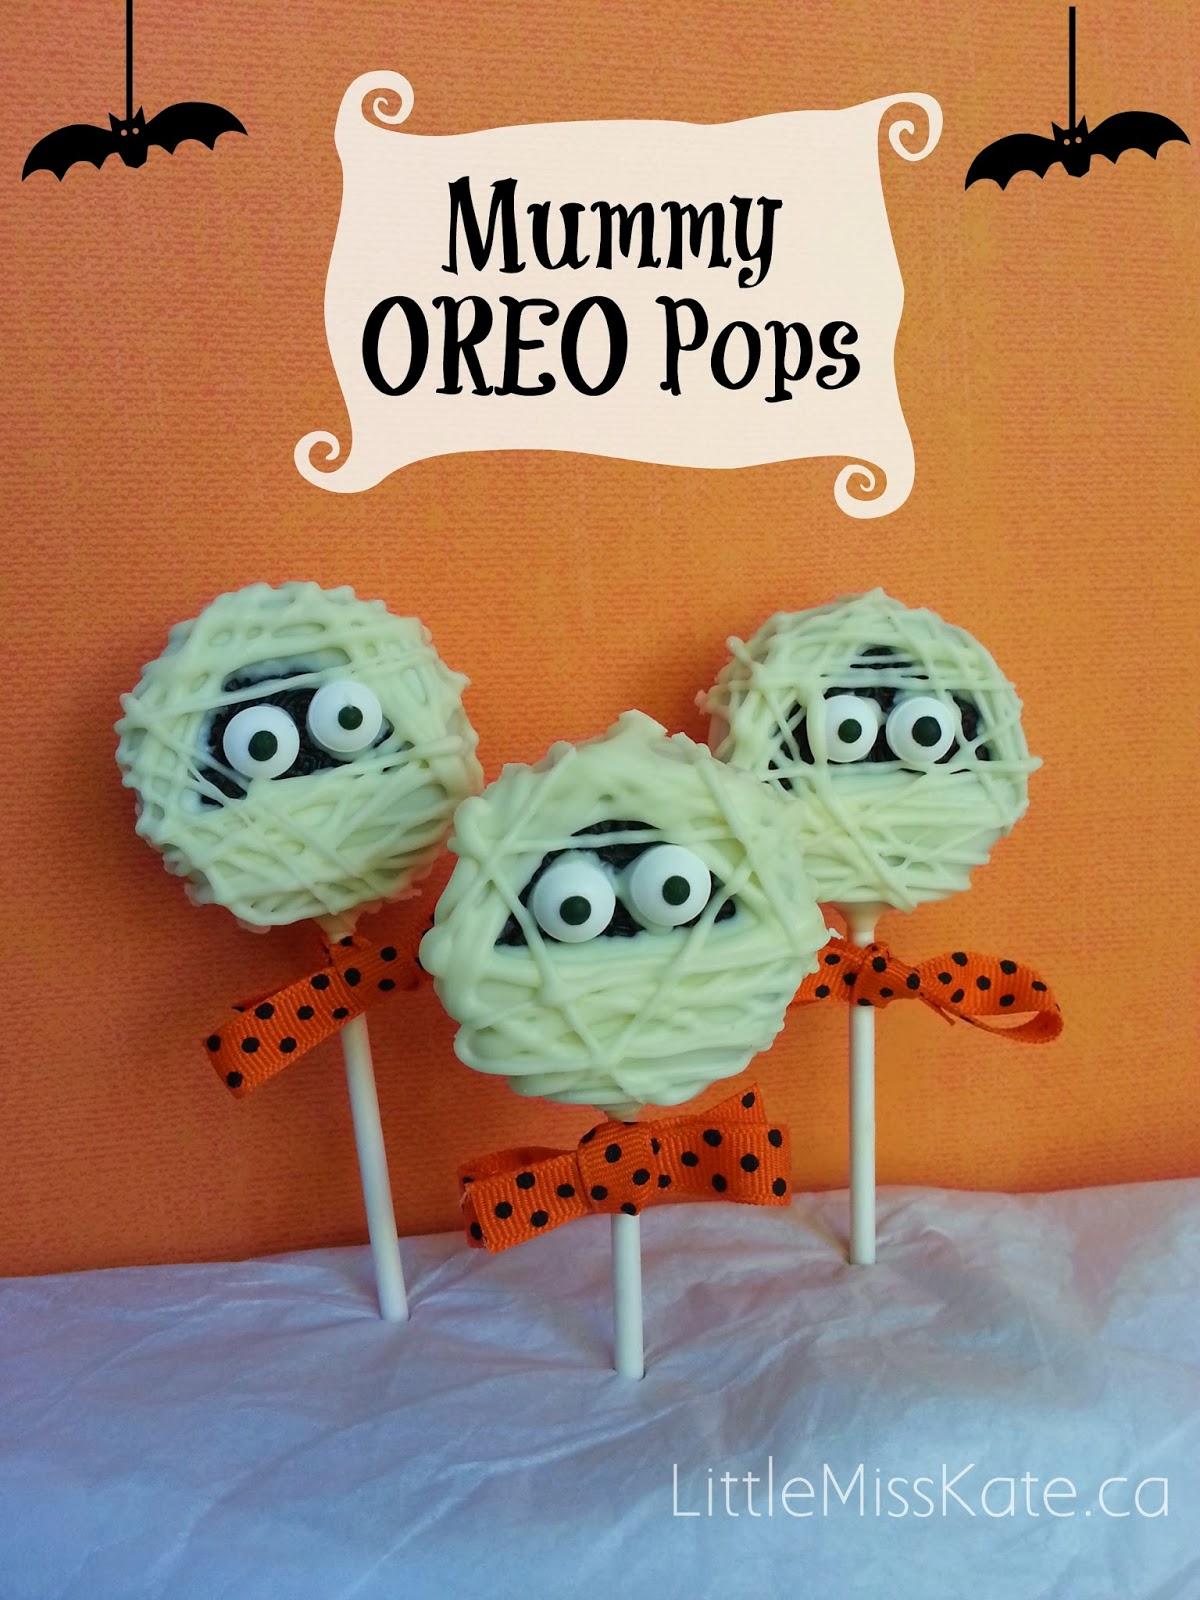 Mummy Oreo Pops